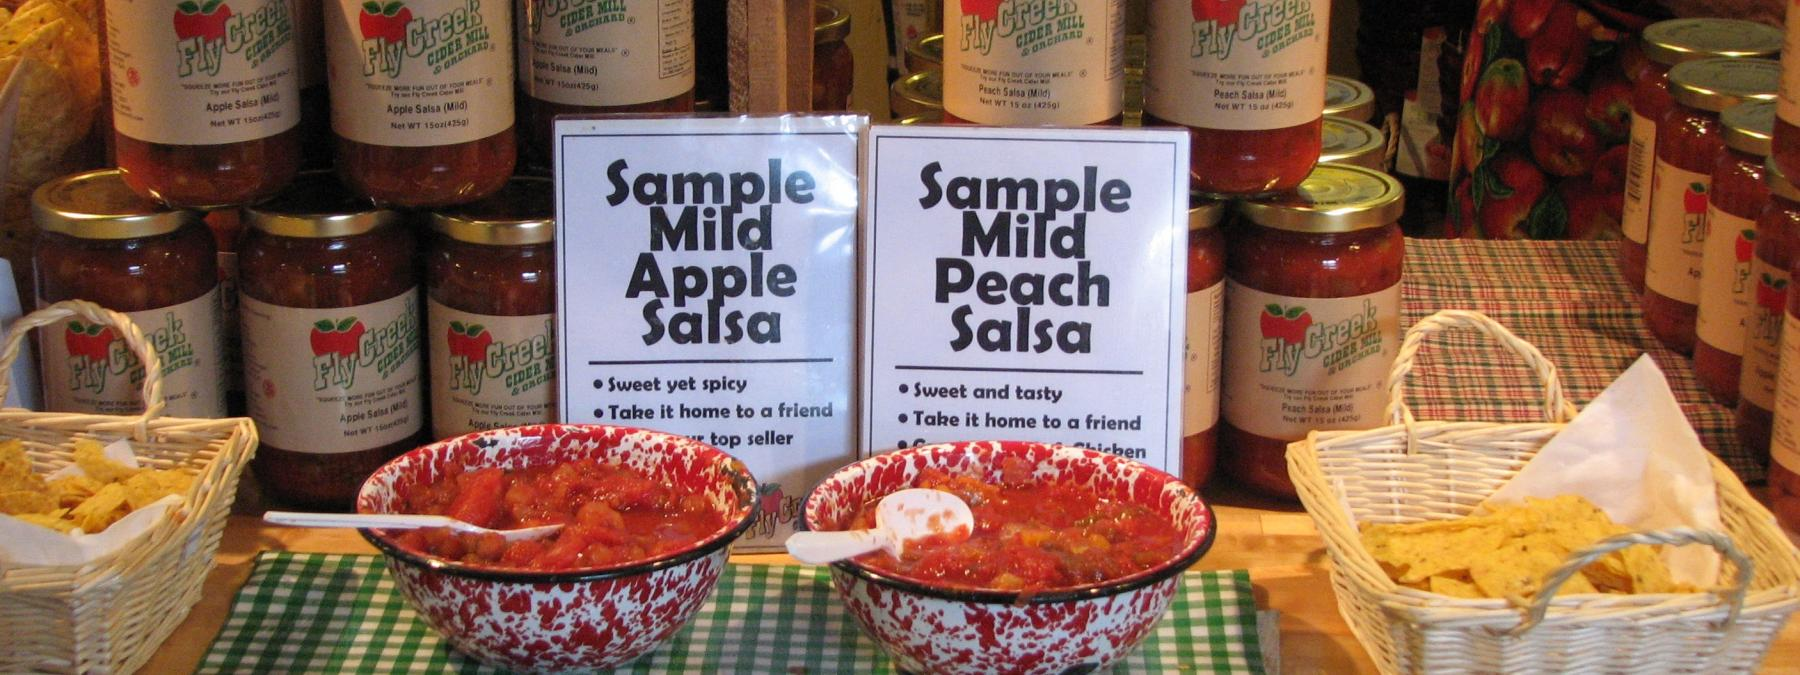 Sample our Apple Salsa